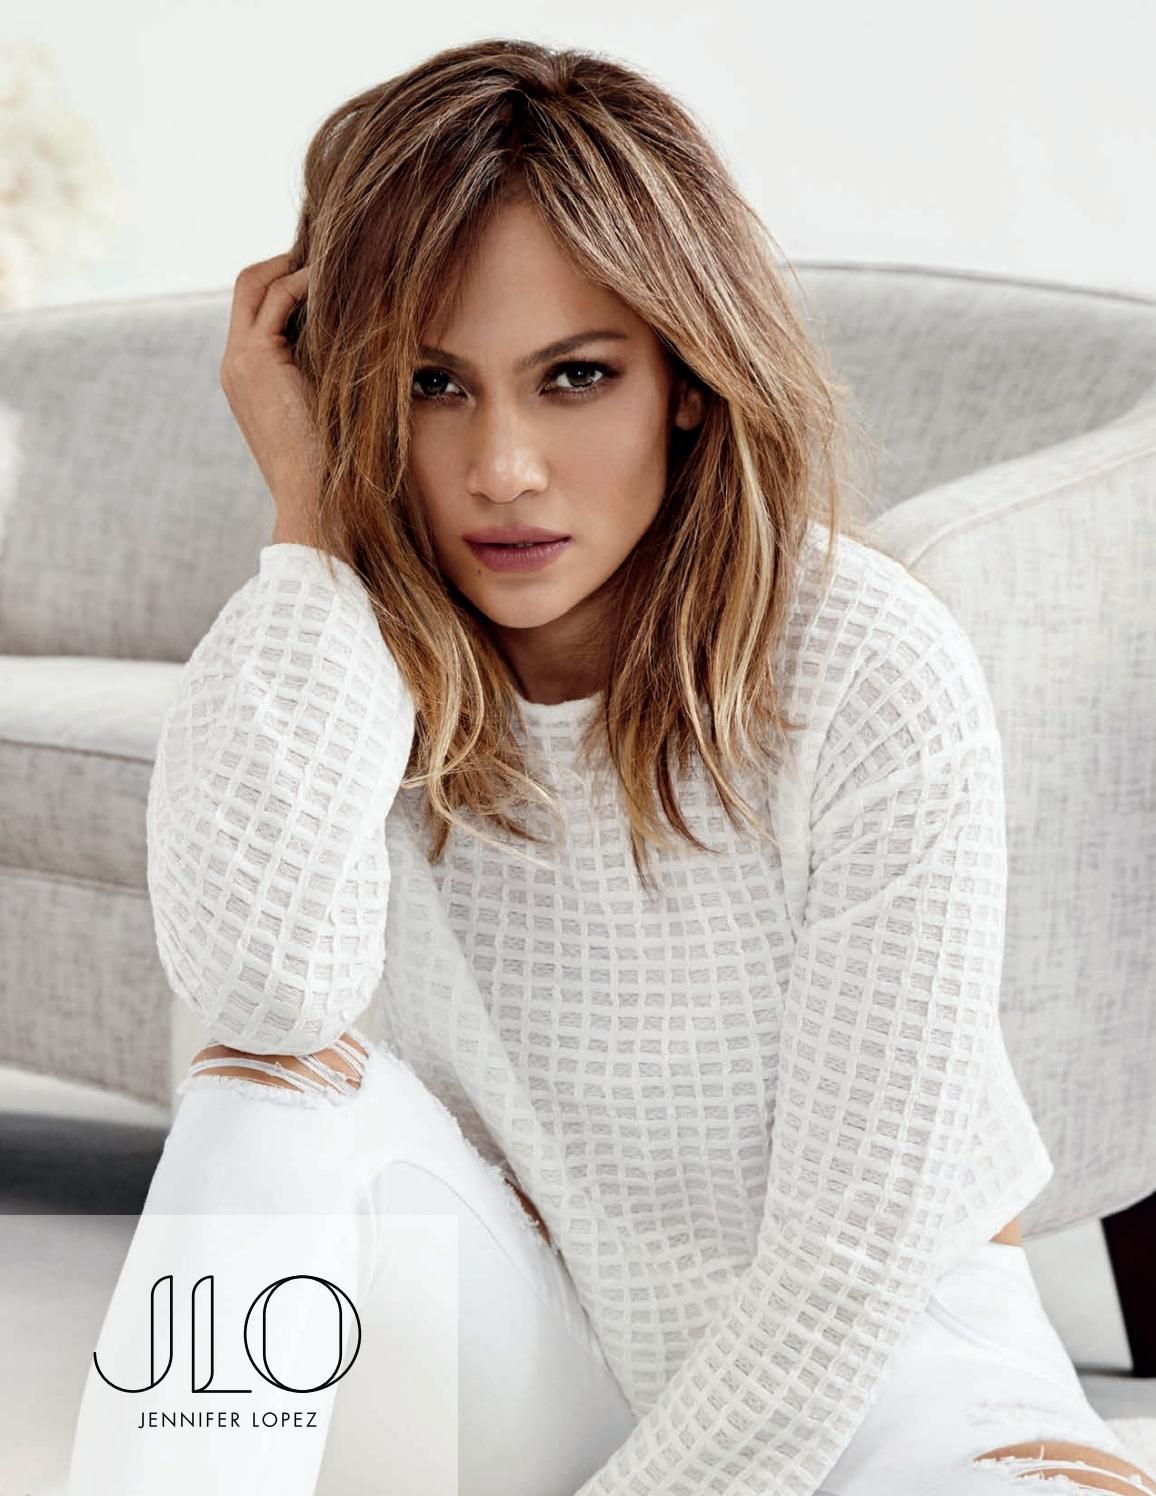 Catalogo Jlo By Jennifer Lopez Hair Styles Shoulder Length Hair Jennifer Lopez Hair